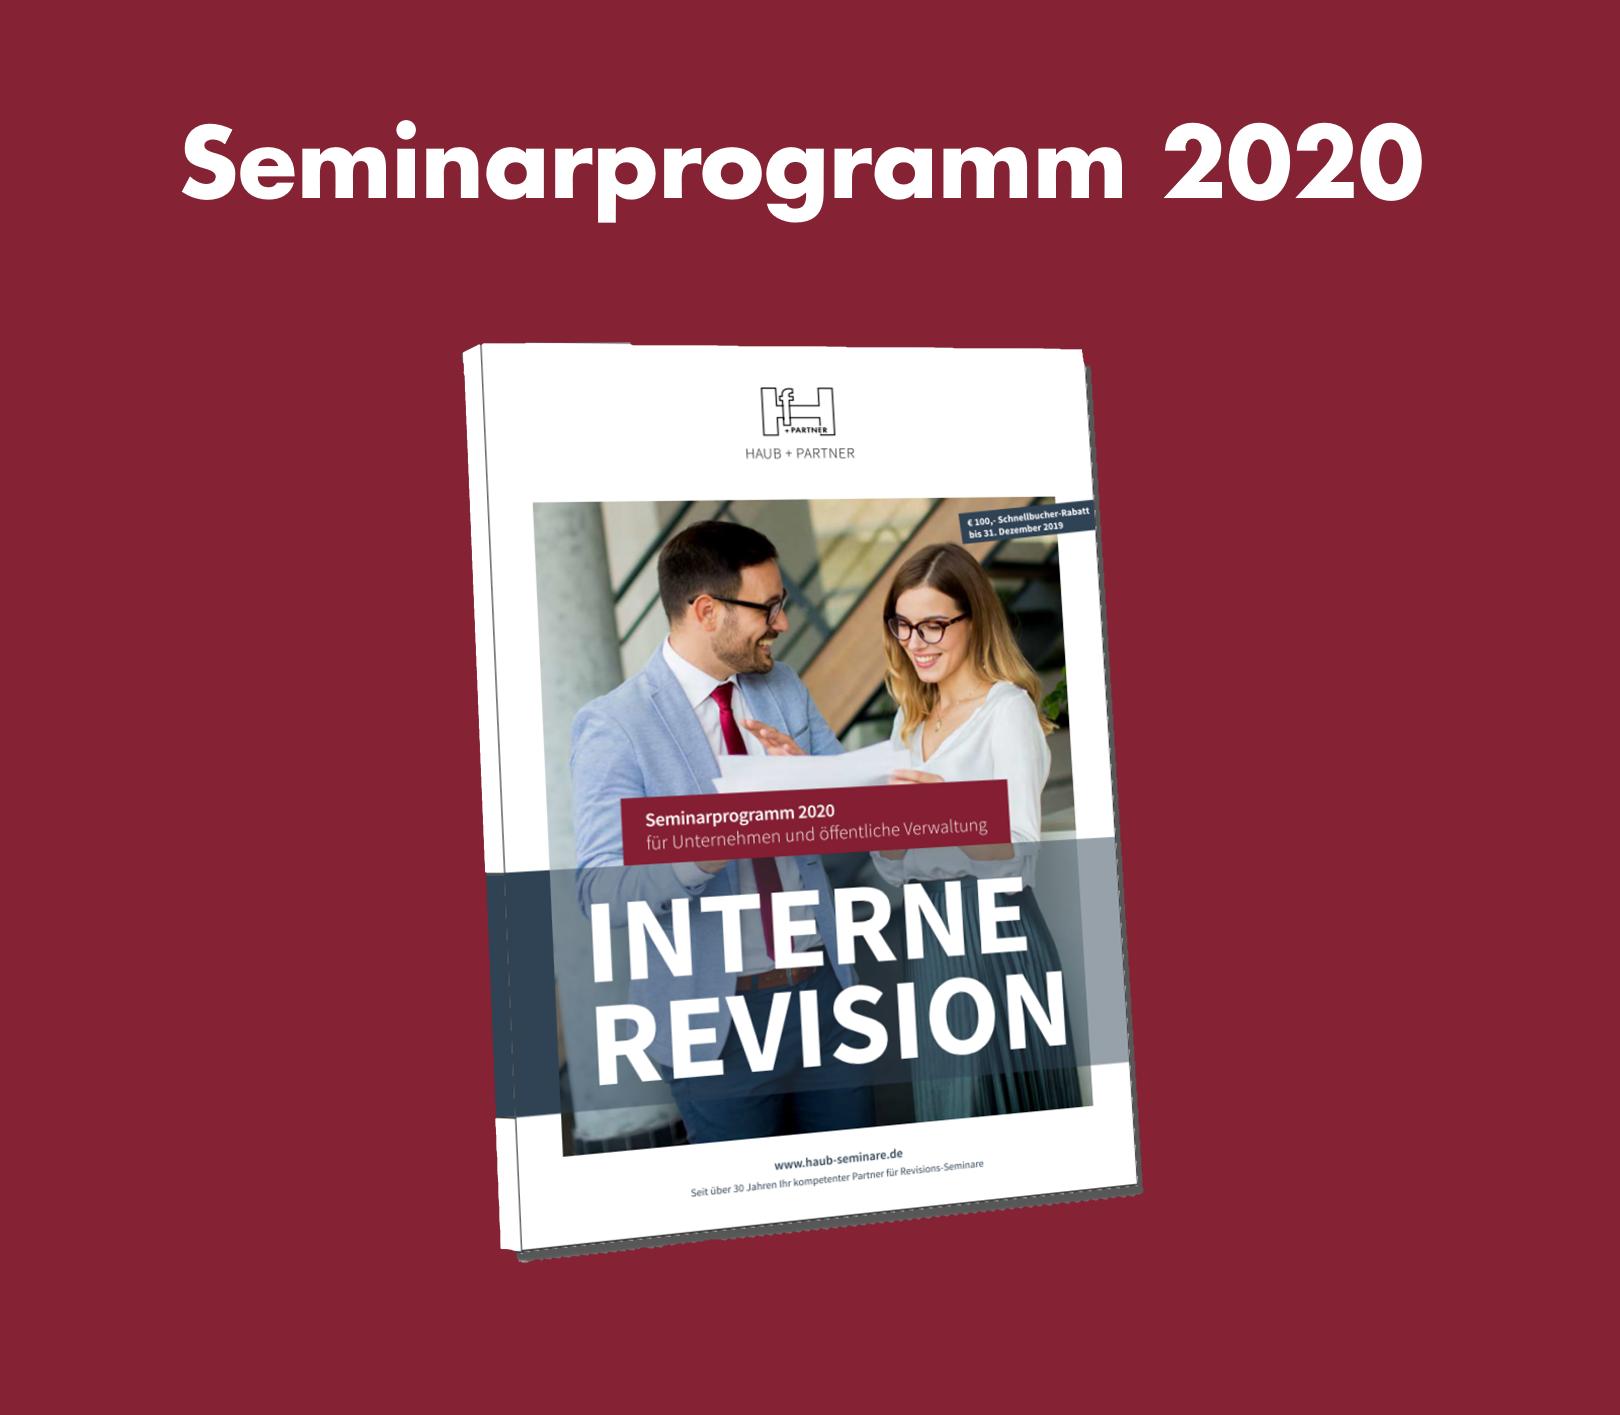 HAUB+PARTNER Seminarprogramm 2020